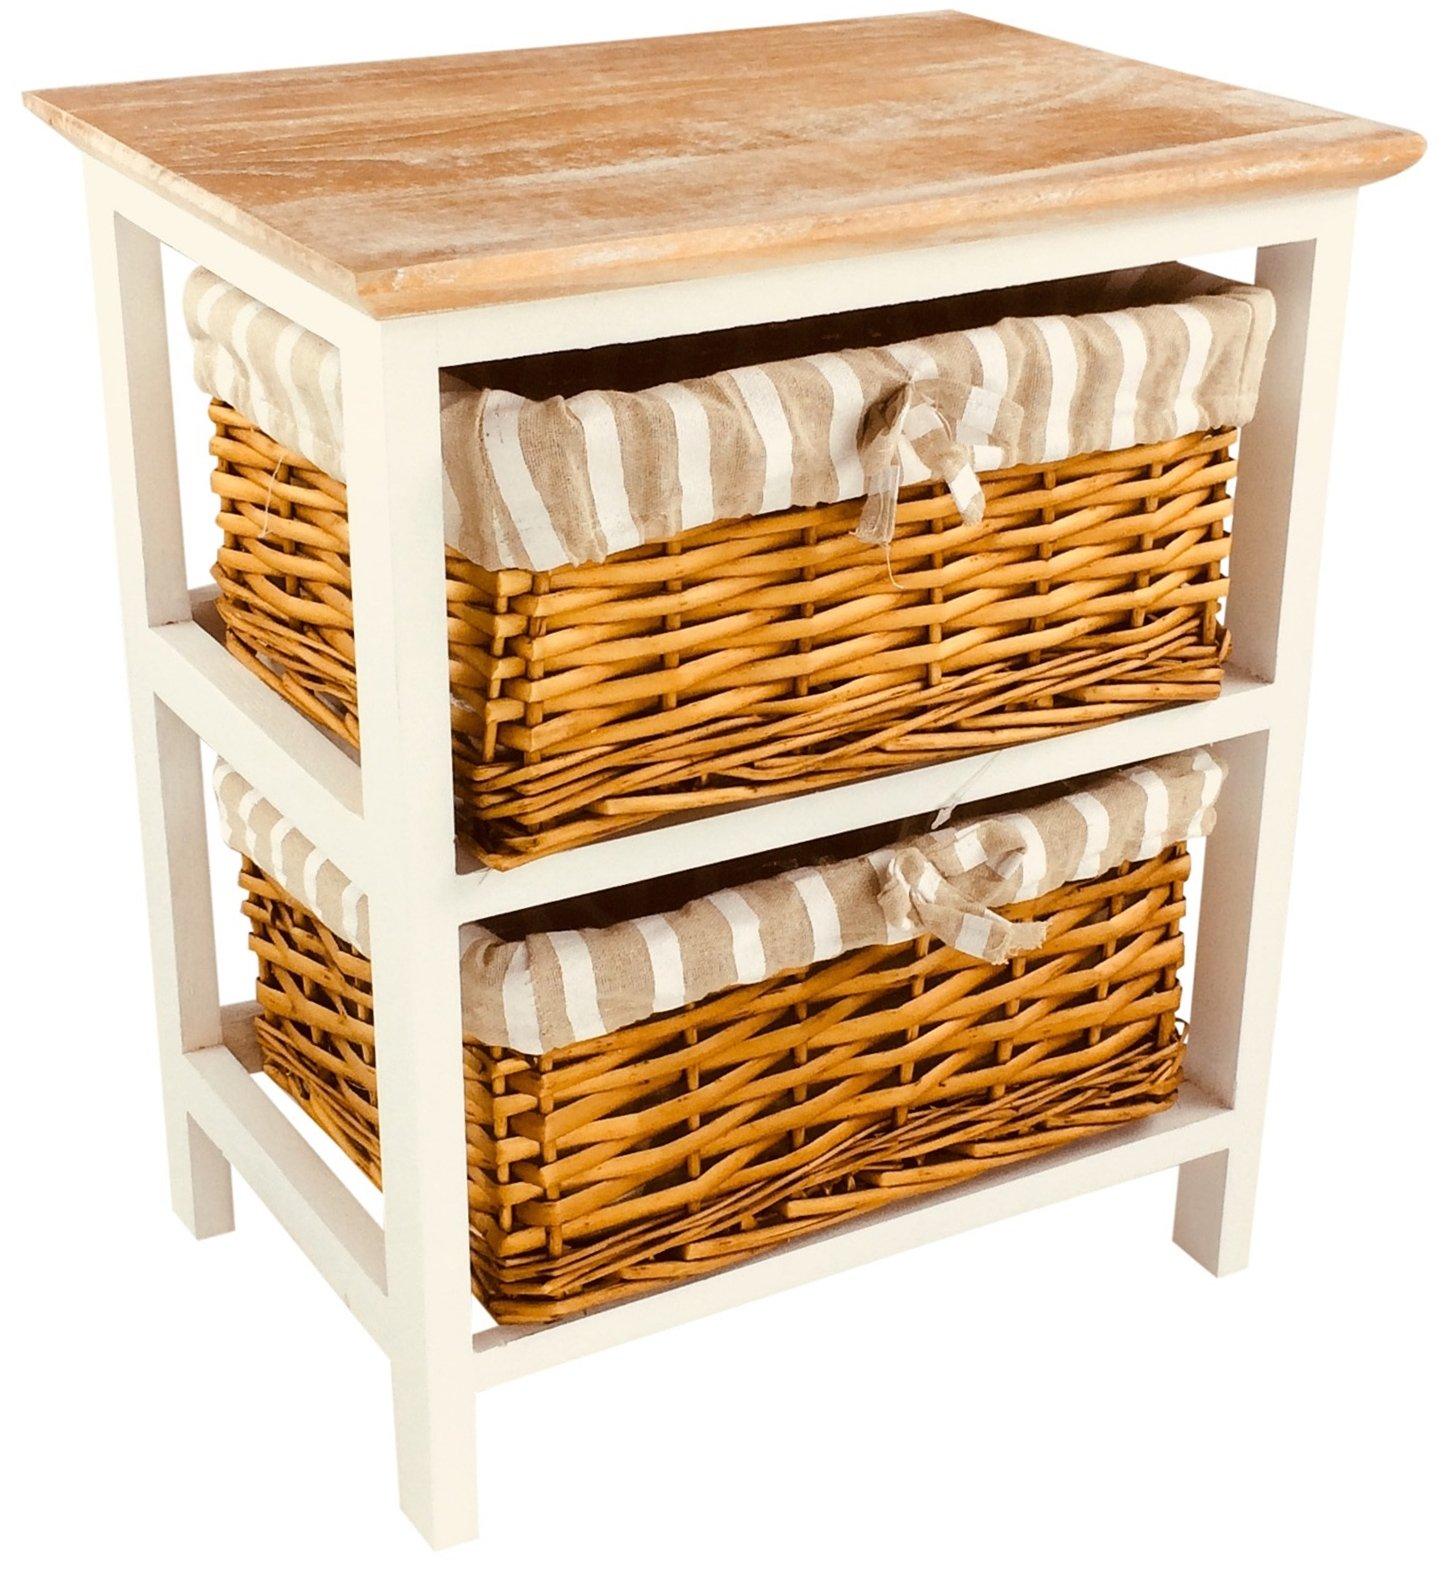 Wooden Storage Cabinet With 2 Baskets 44cm